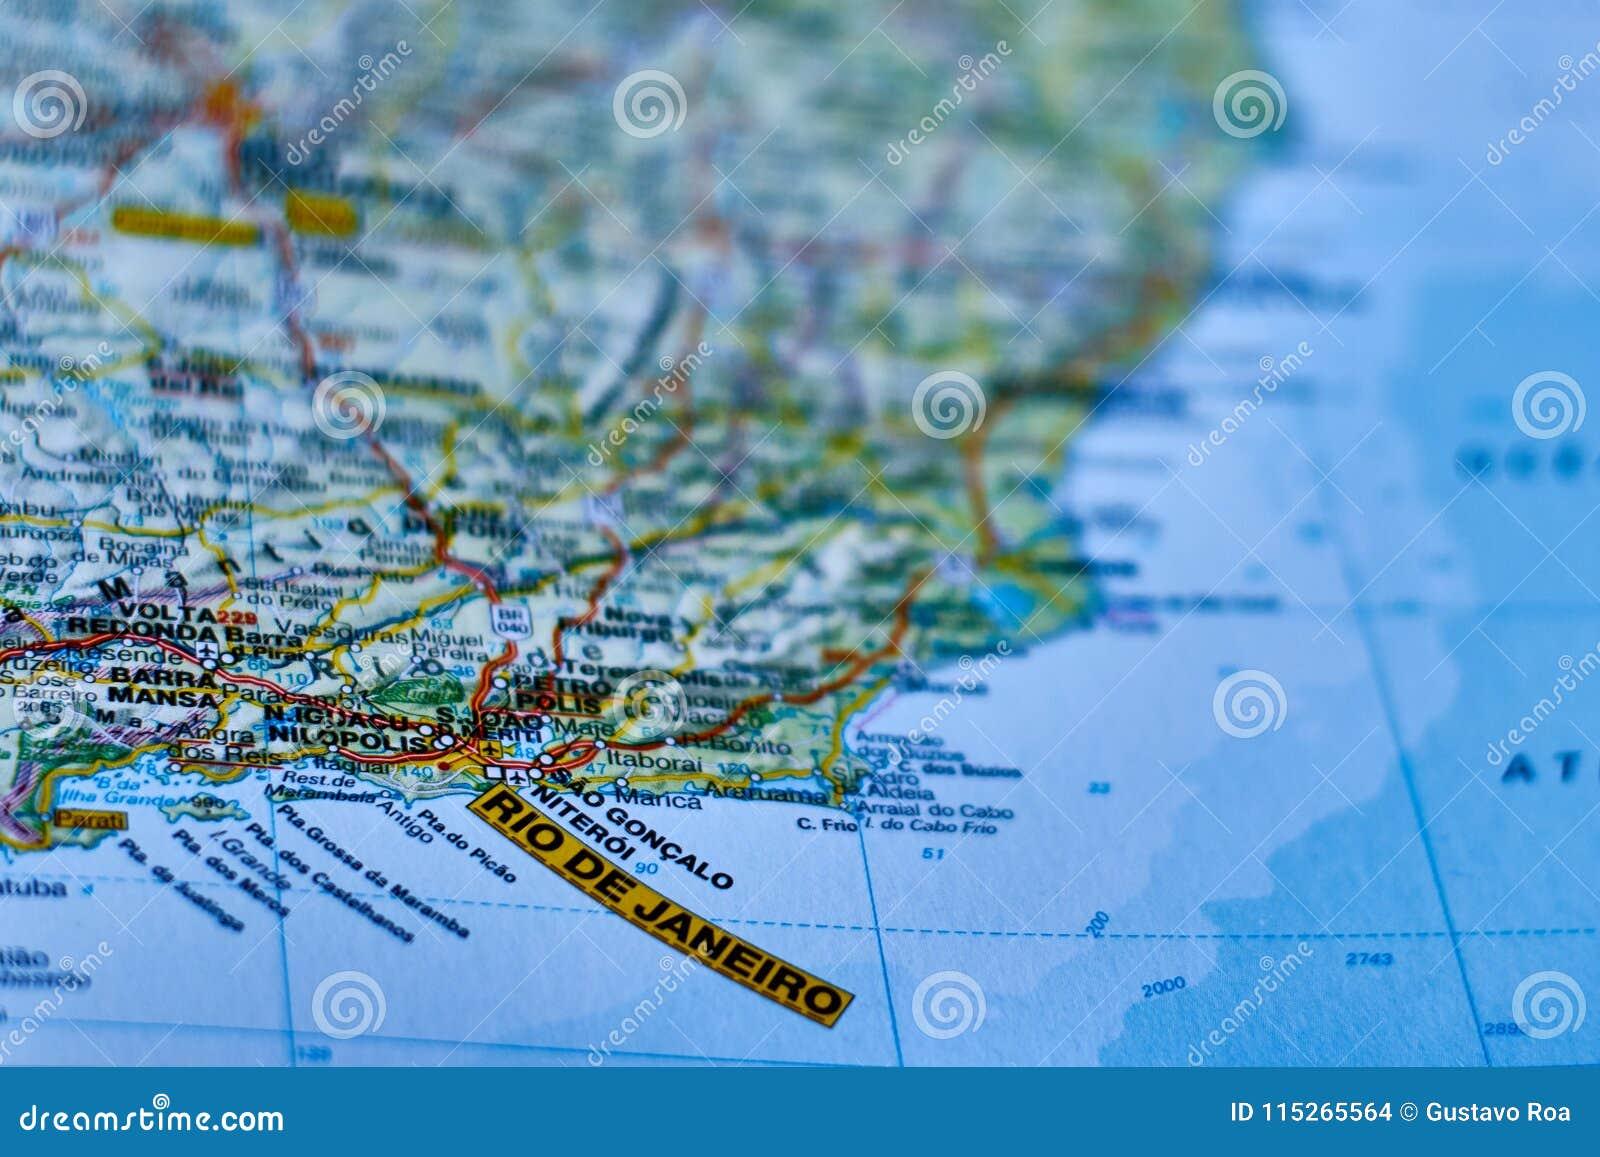 Map of the city of rio de janeiro stock photo image of close download map of the city of rio de janeiro stock photo image of close gumiabroncs Images